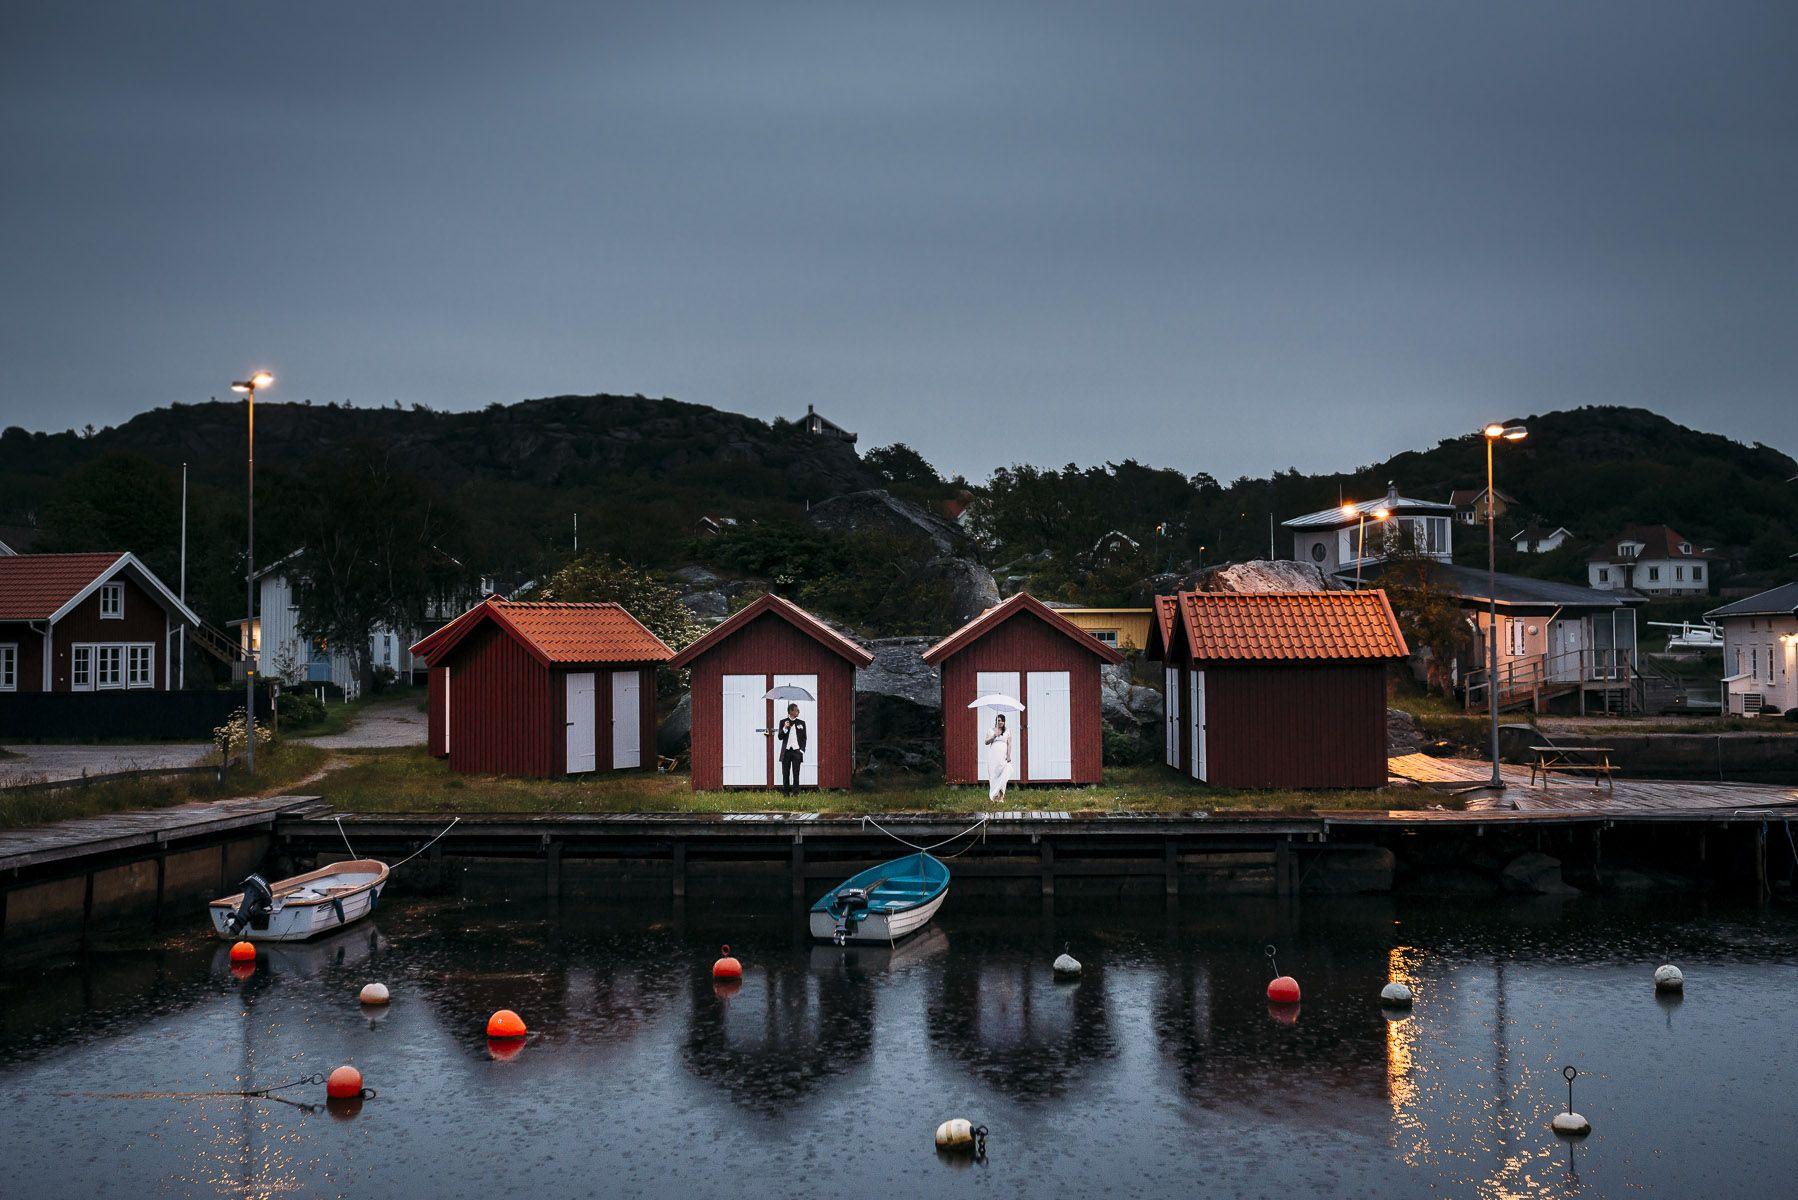 Henrik & Jenny - Axel & Berg - A Swedish Destination Wedding Photography Duo